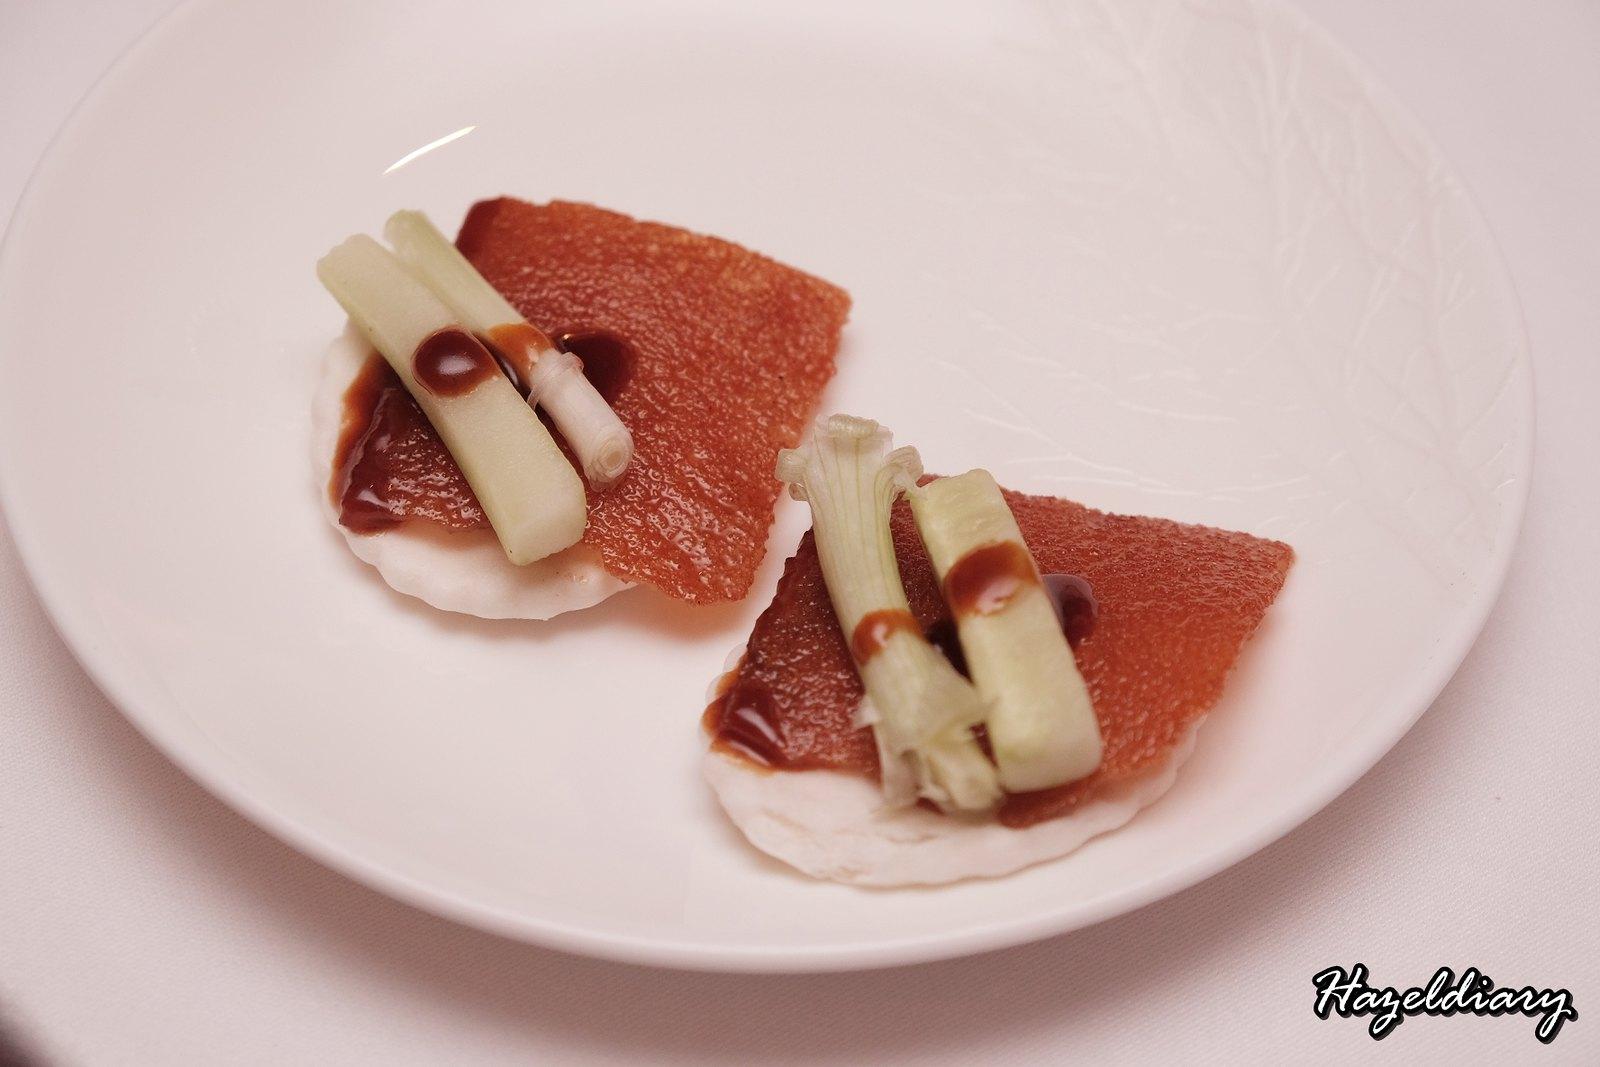 Yan Cantonese Cuisine-Roasted Suckling Pig-Crispy Skin